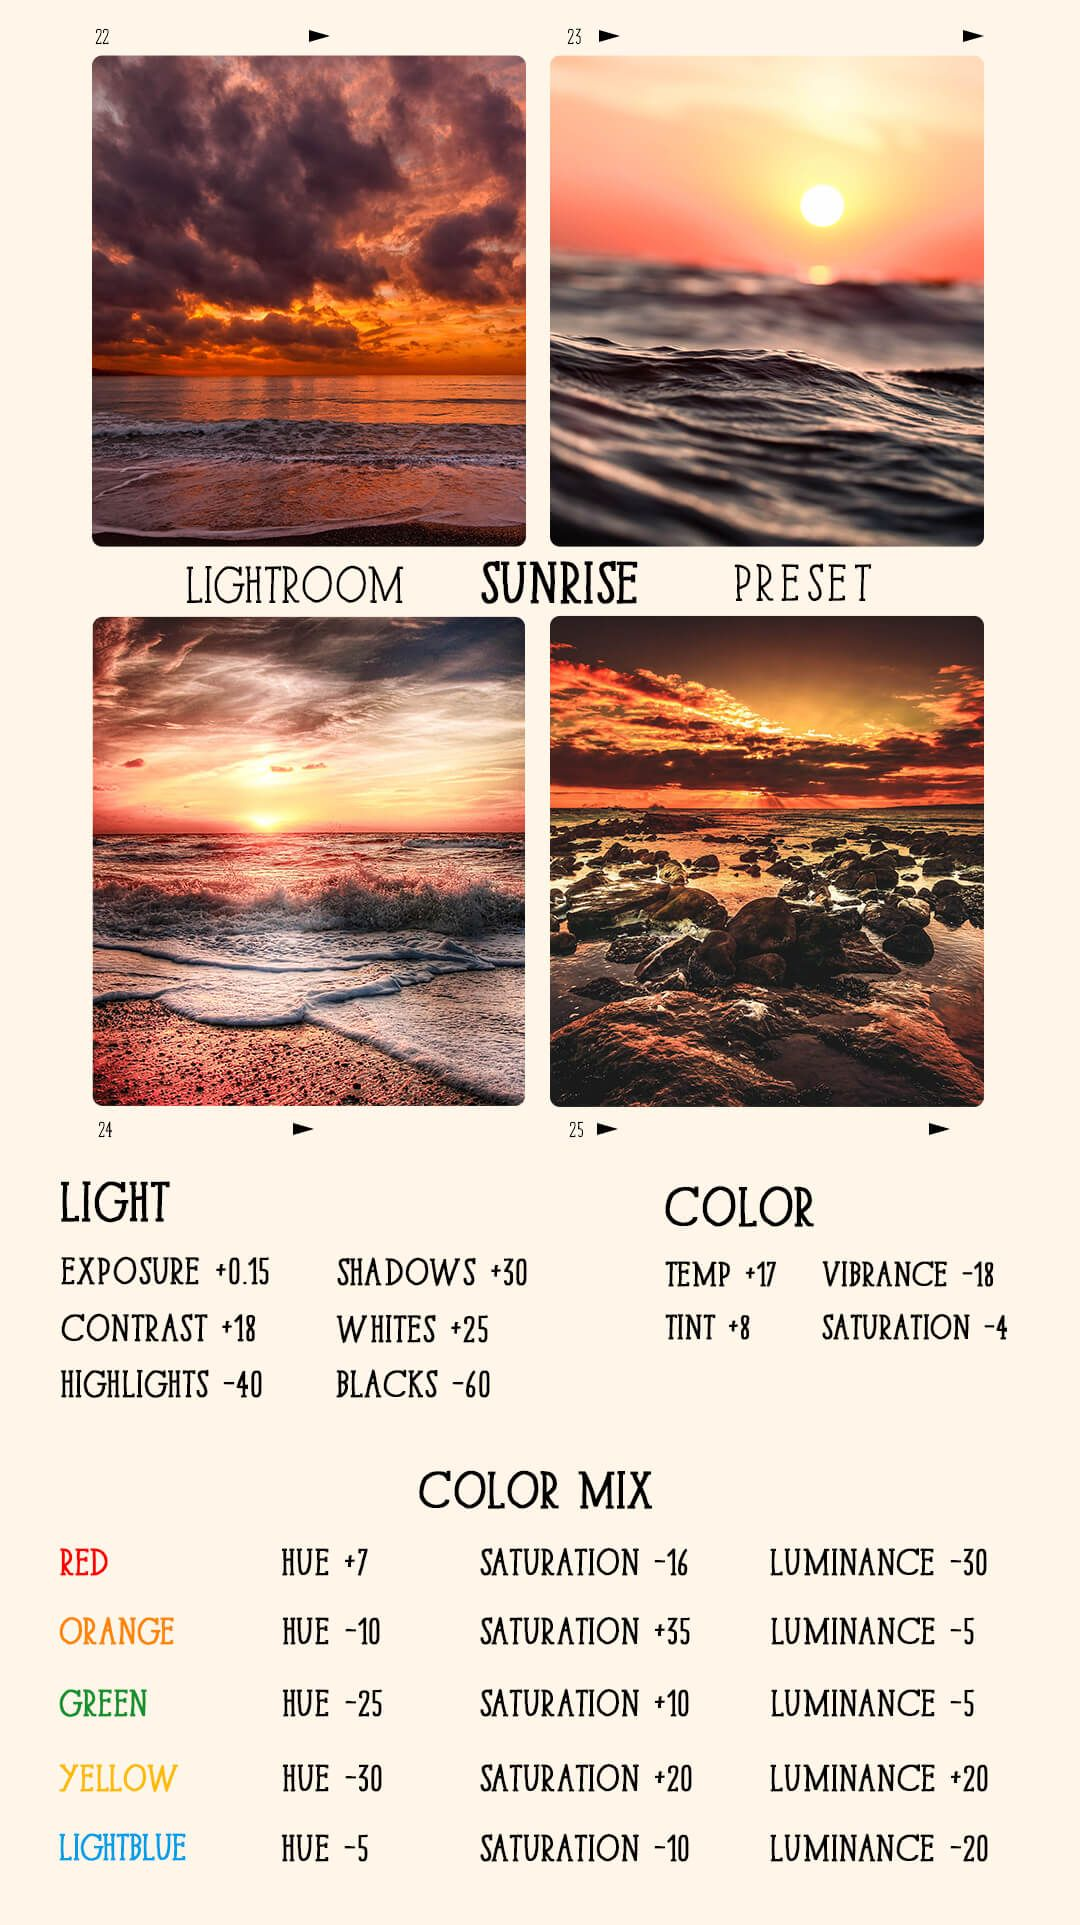 Lr Effects Free Sunrise Preset Lightroom Lightroom Tutorial Photo Editing Lightroom Presets Tutorial Lightroom Presets